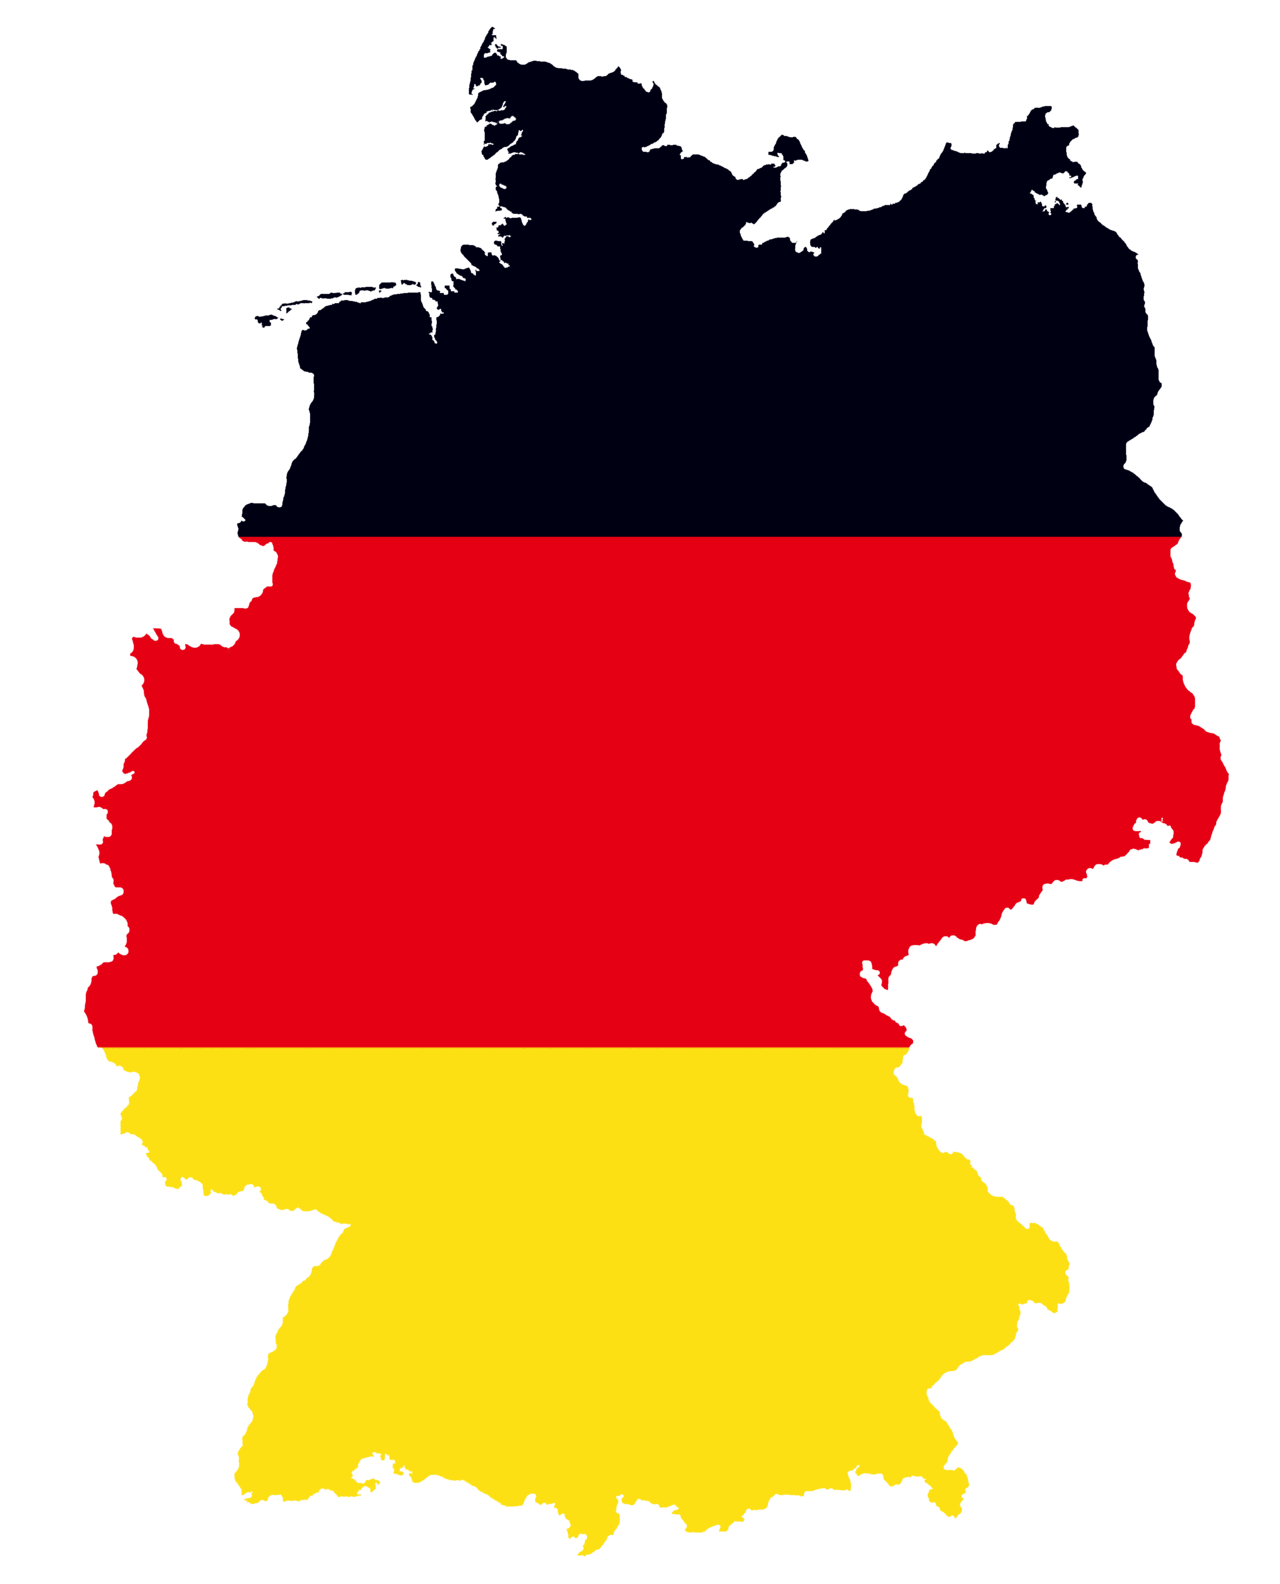 Neighbors clipart townhouse. German flag png transparent